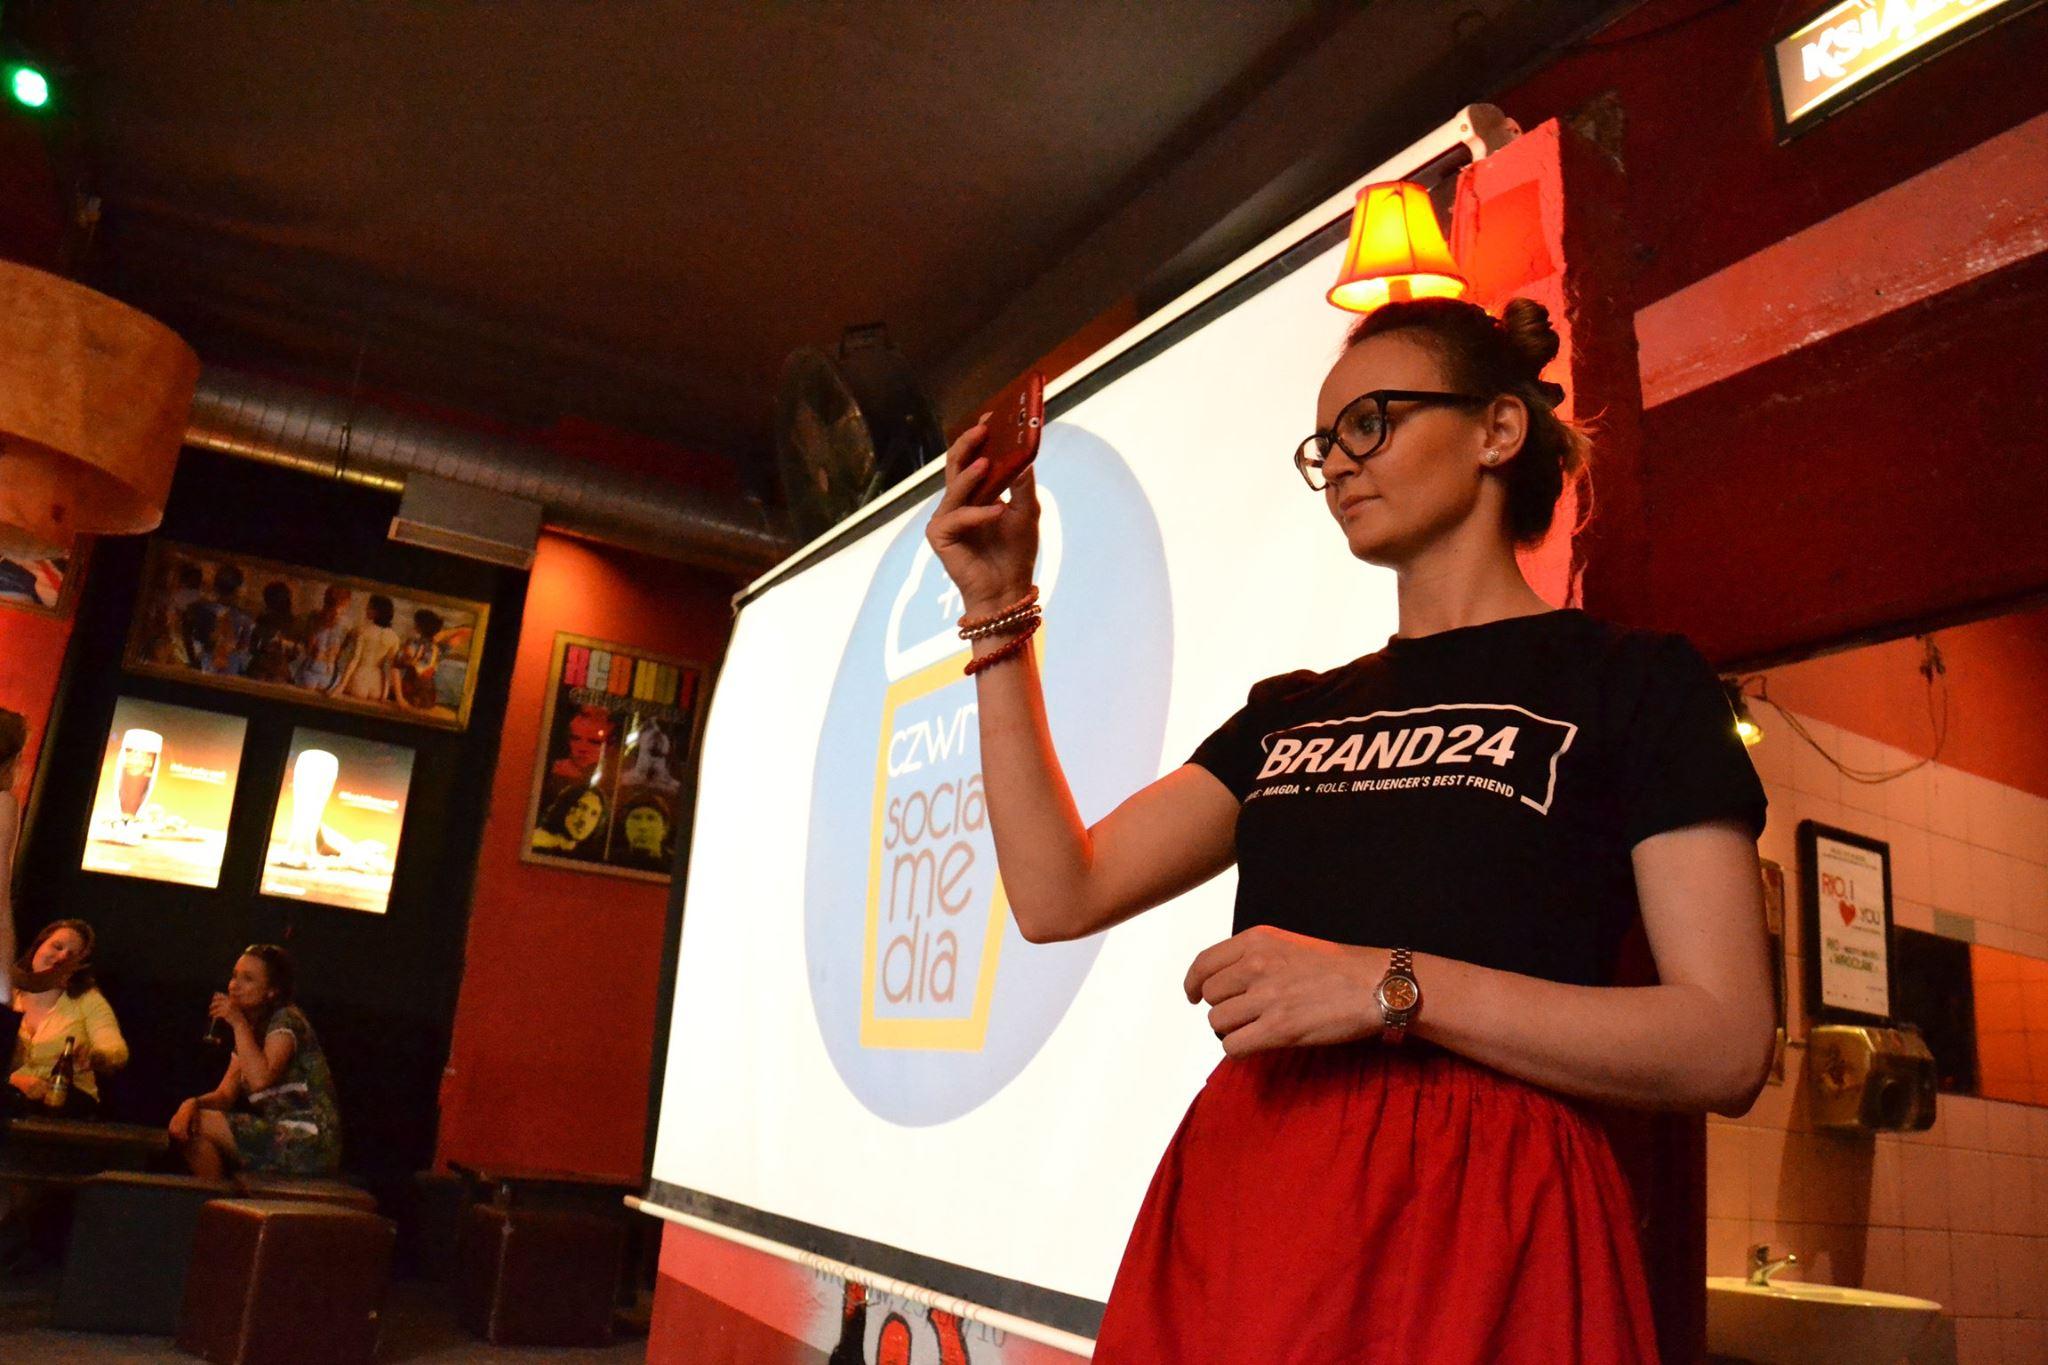 Polonia: #DigitalTalk con Magdalena Urbaniak